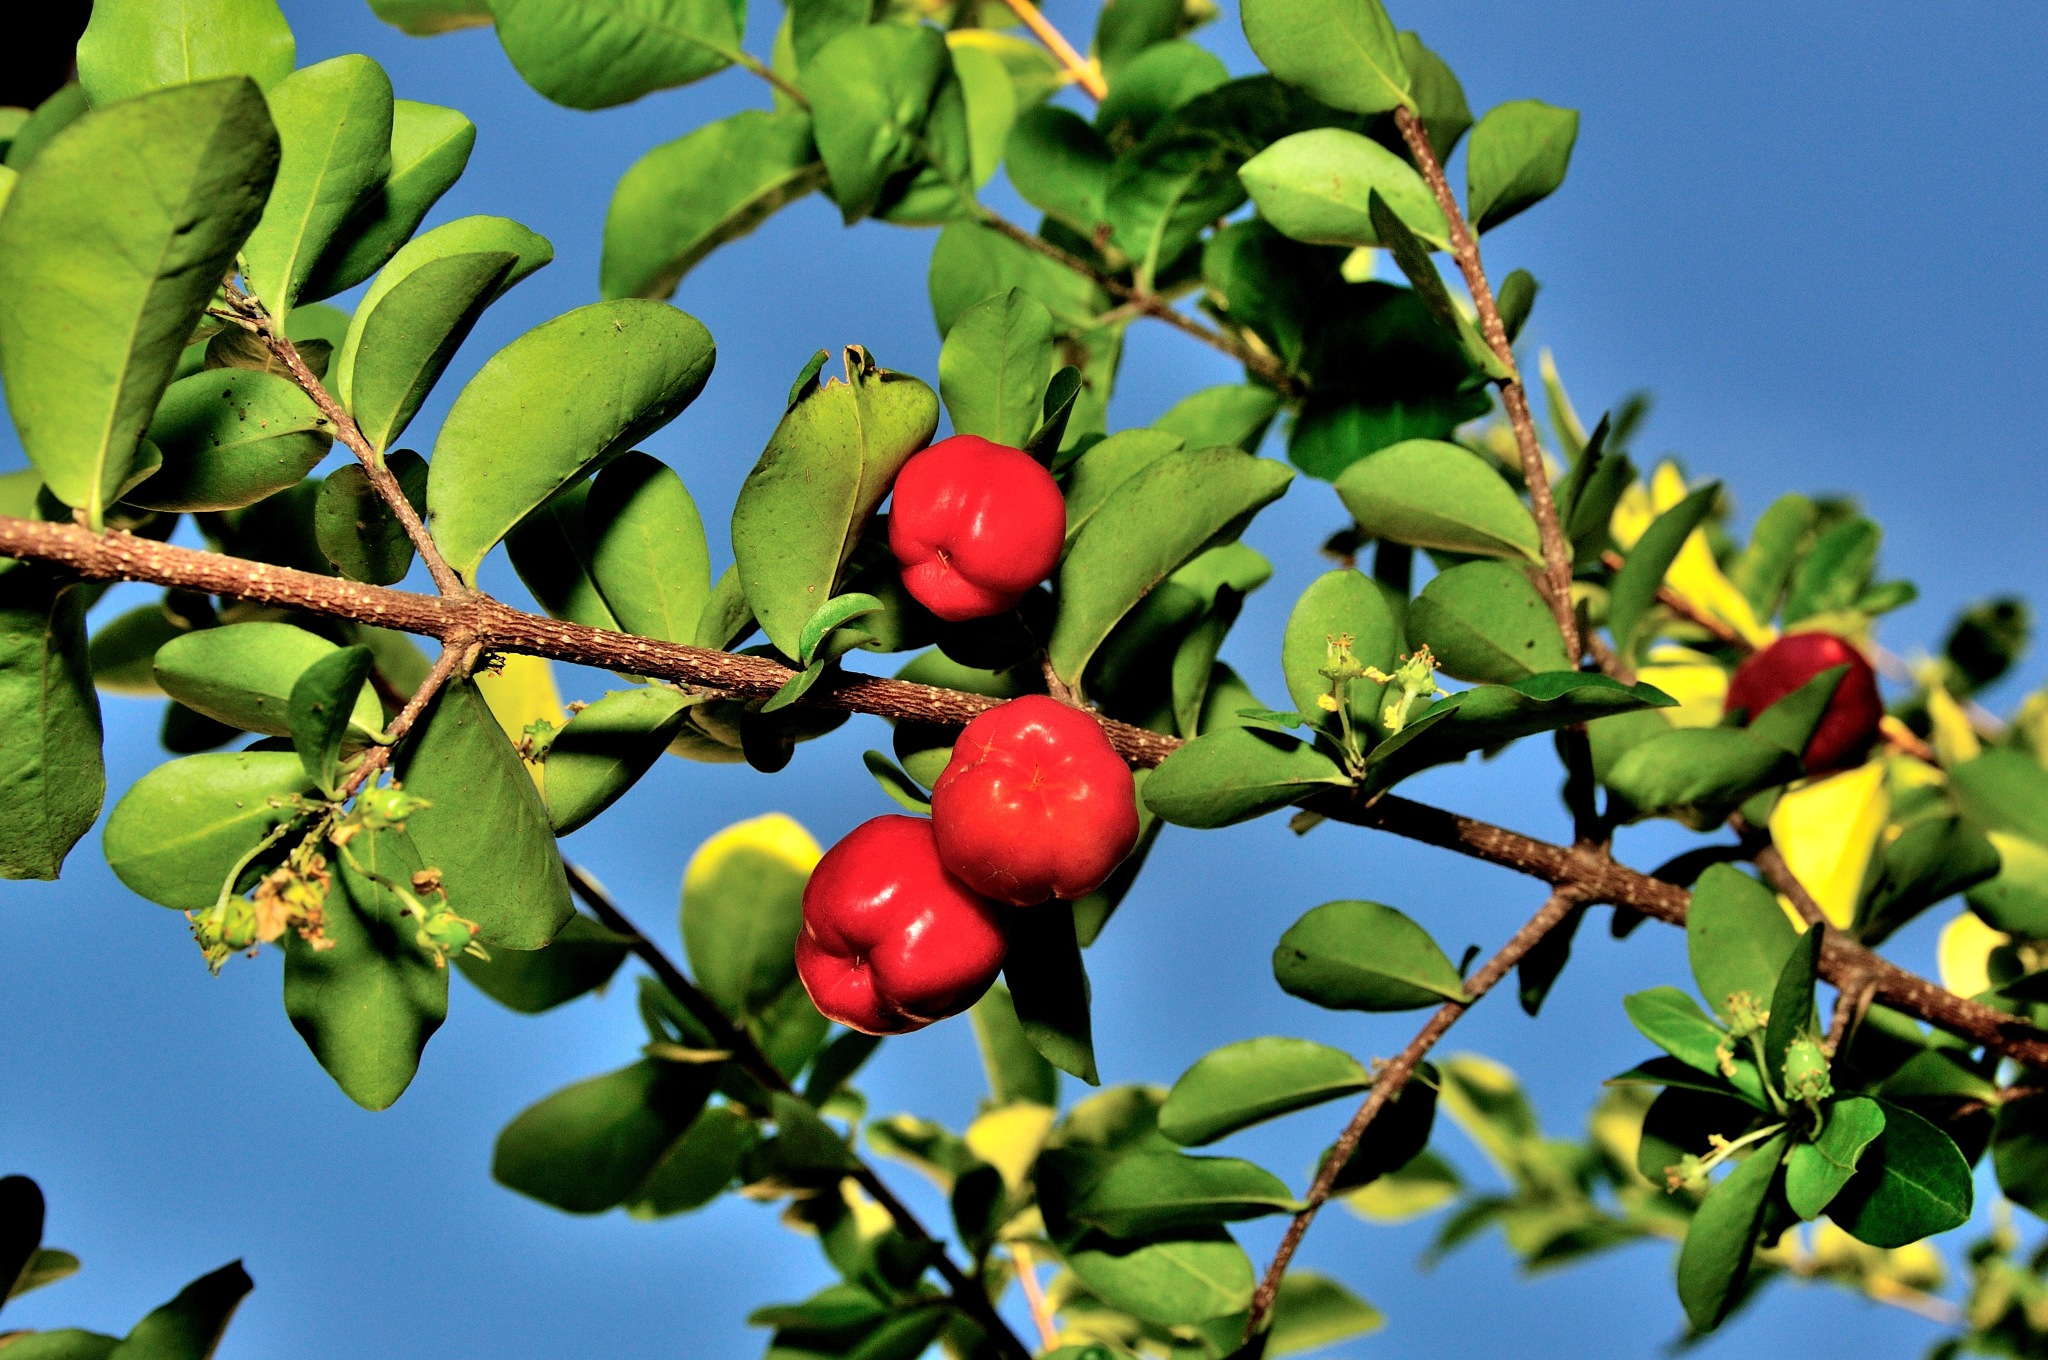 Barbados cherry by jluiz